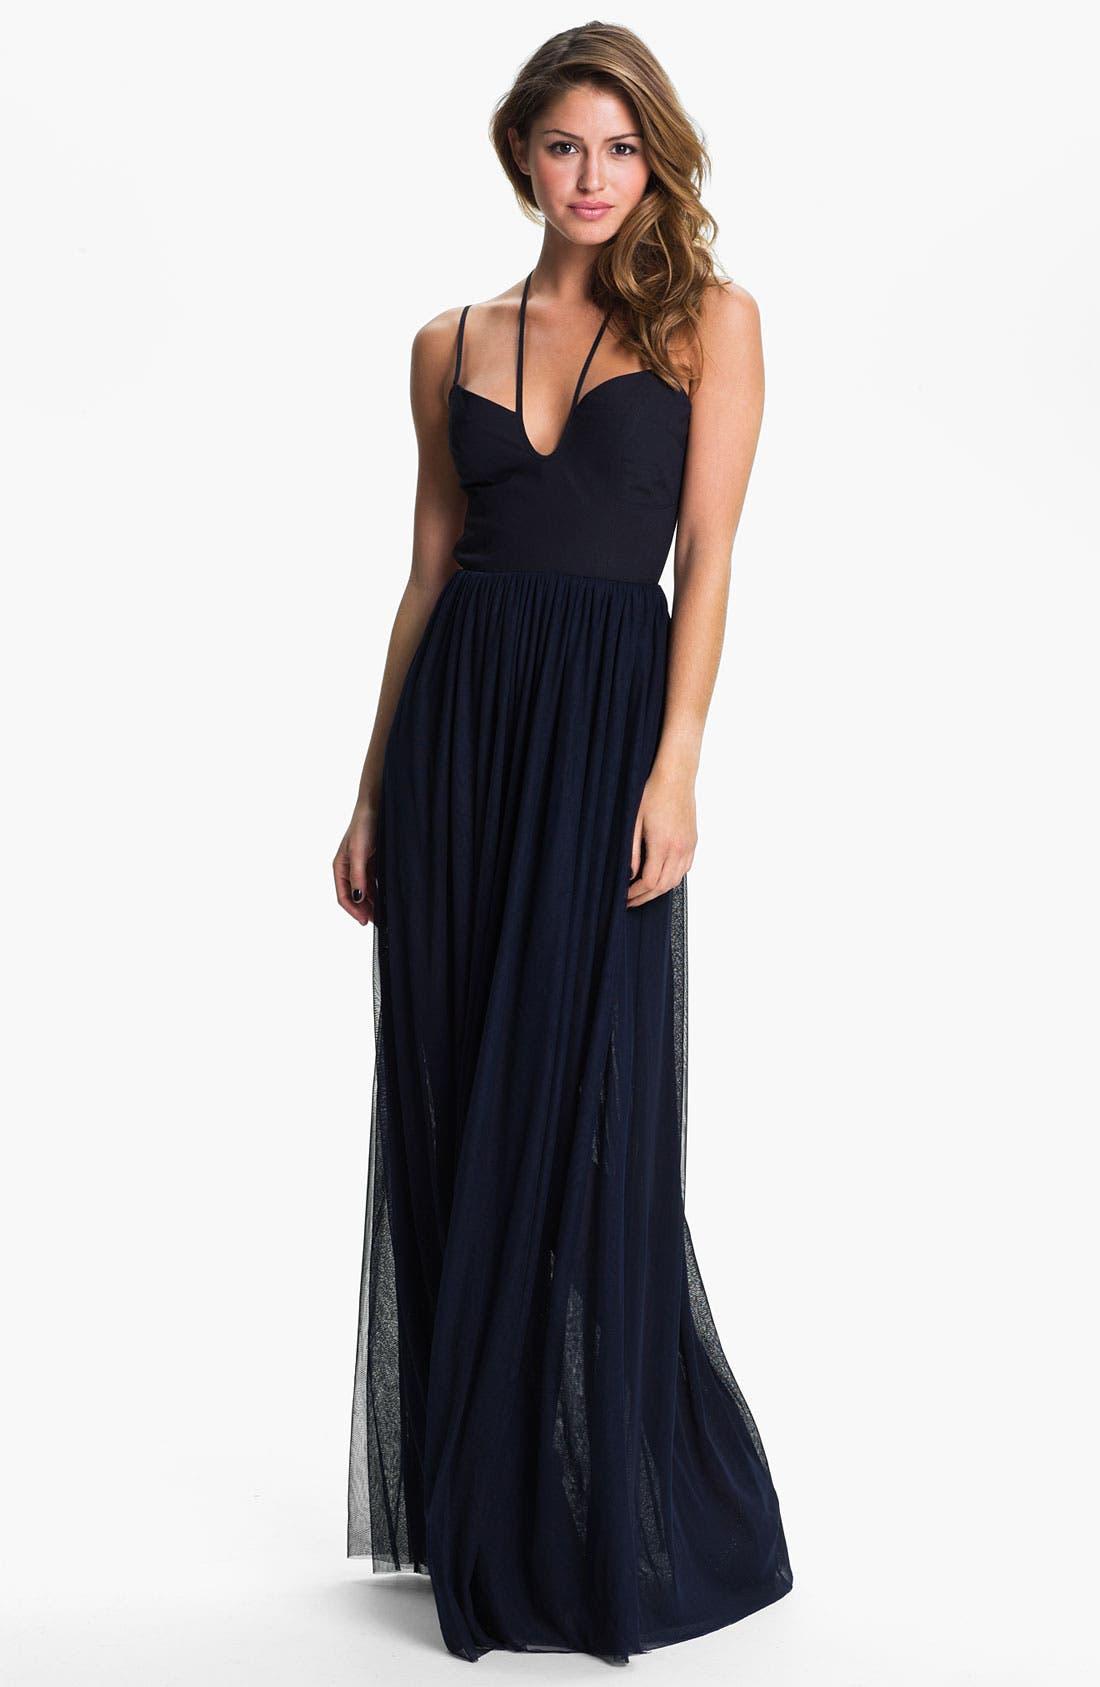 Alternate Image 1 Selected - Keepsake the Label 'Smoke & Mirrors' Back Cutout Mesh Maxi Dress